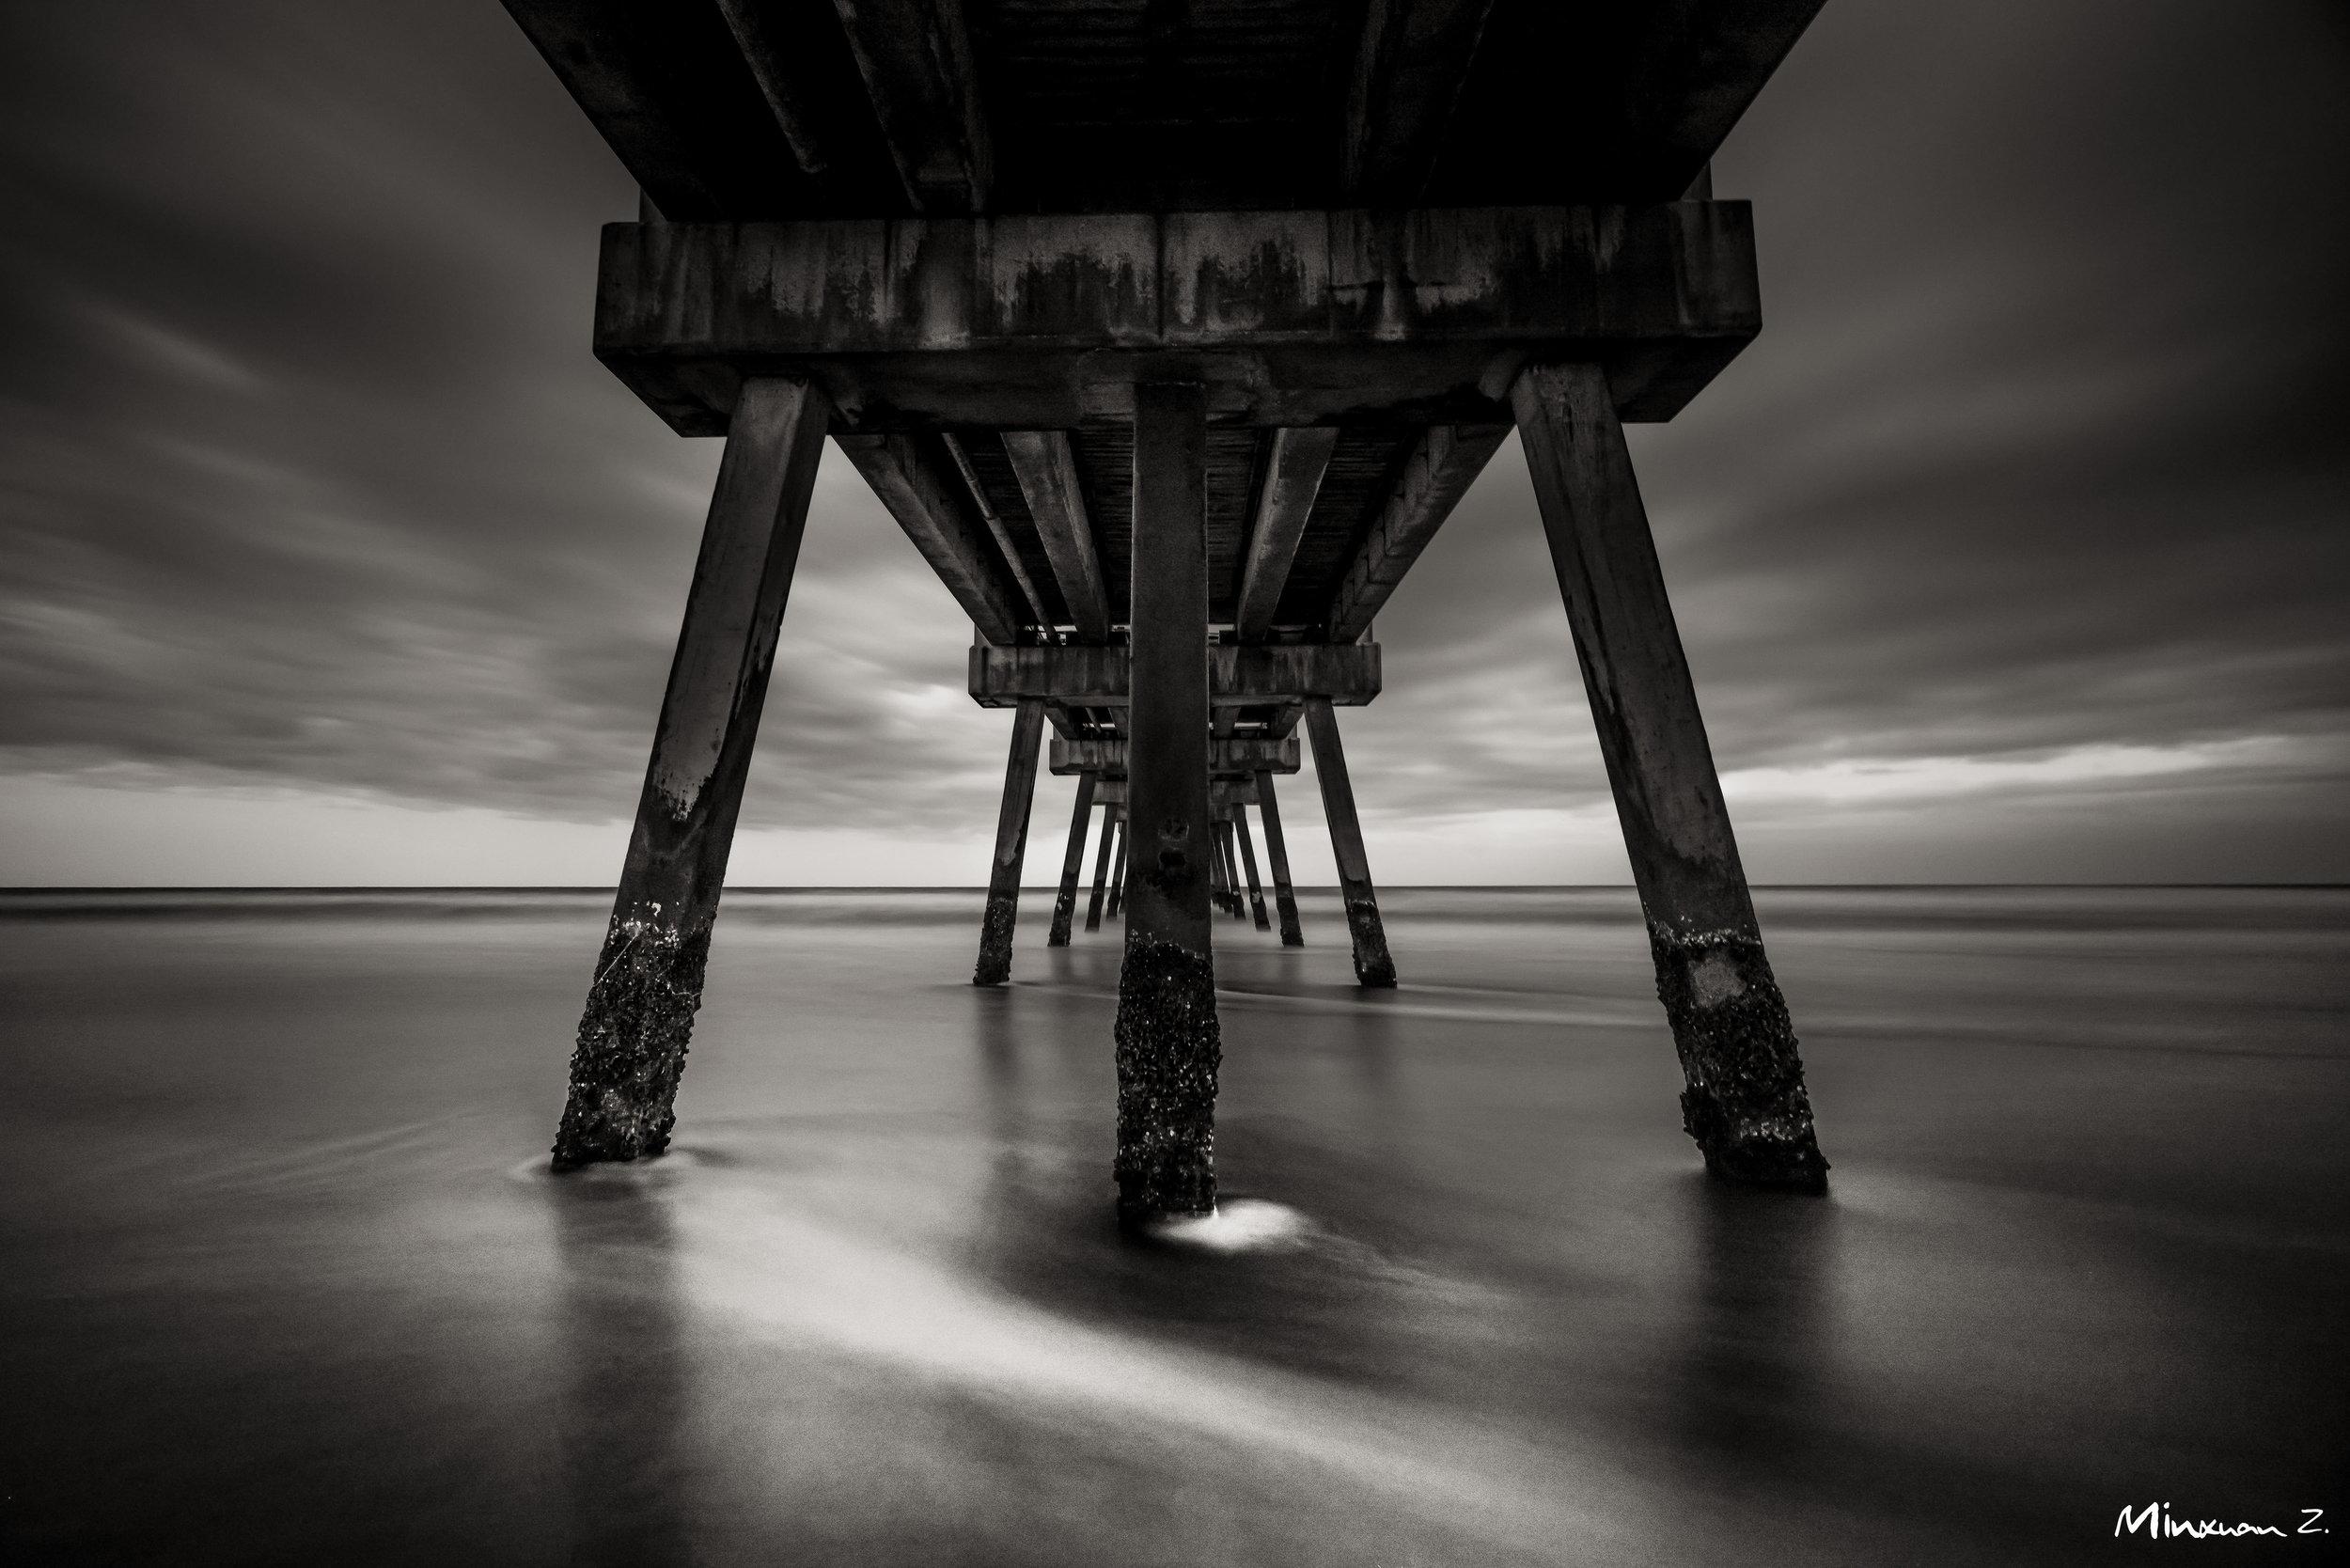 The Pier II